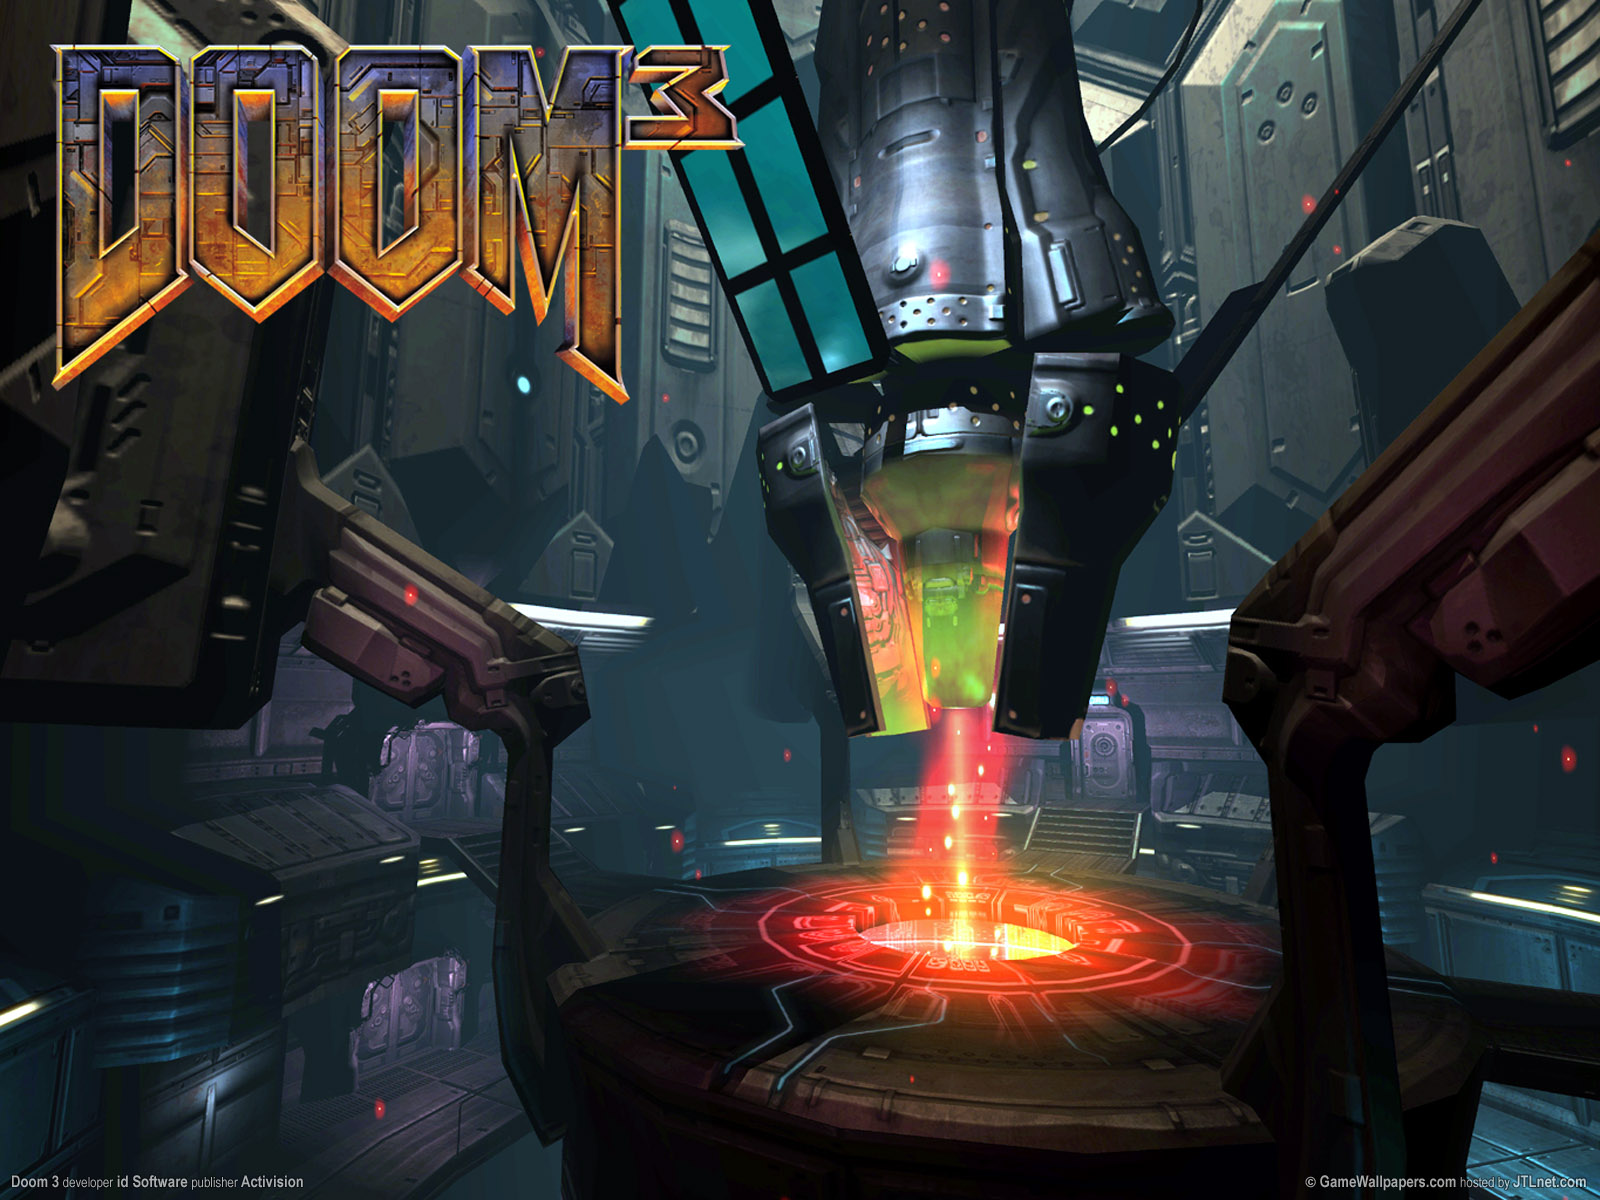 49+] Doom 3 Wallpapers on WallpaperSafari